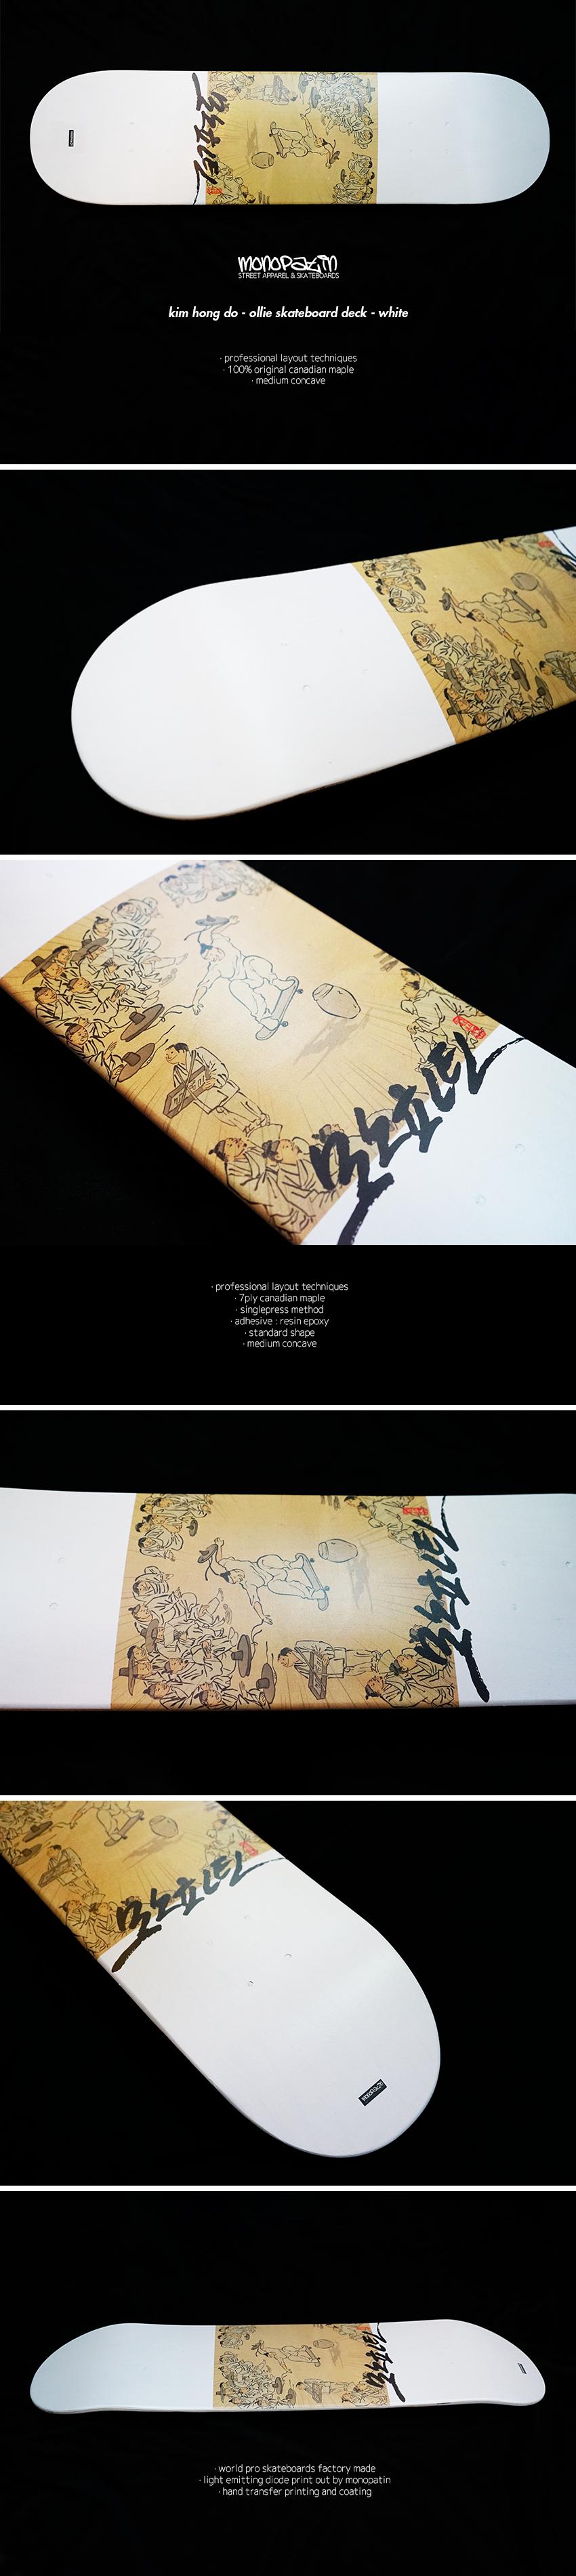 monopatin-kim-hong-do-ollie--skateboard-deck-white (8).png